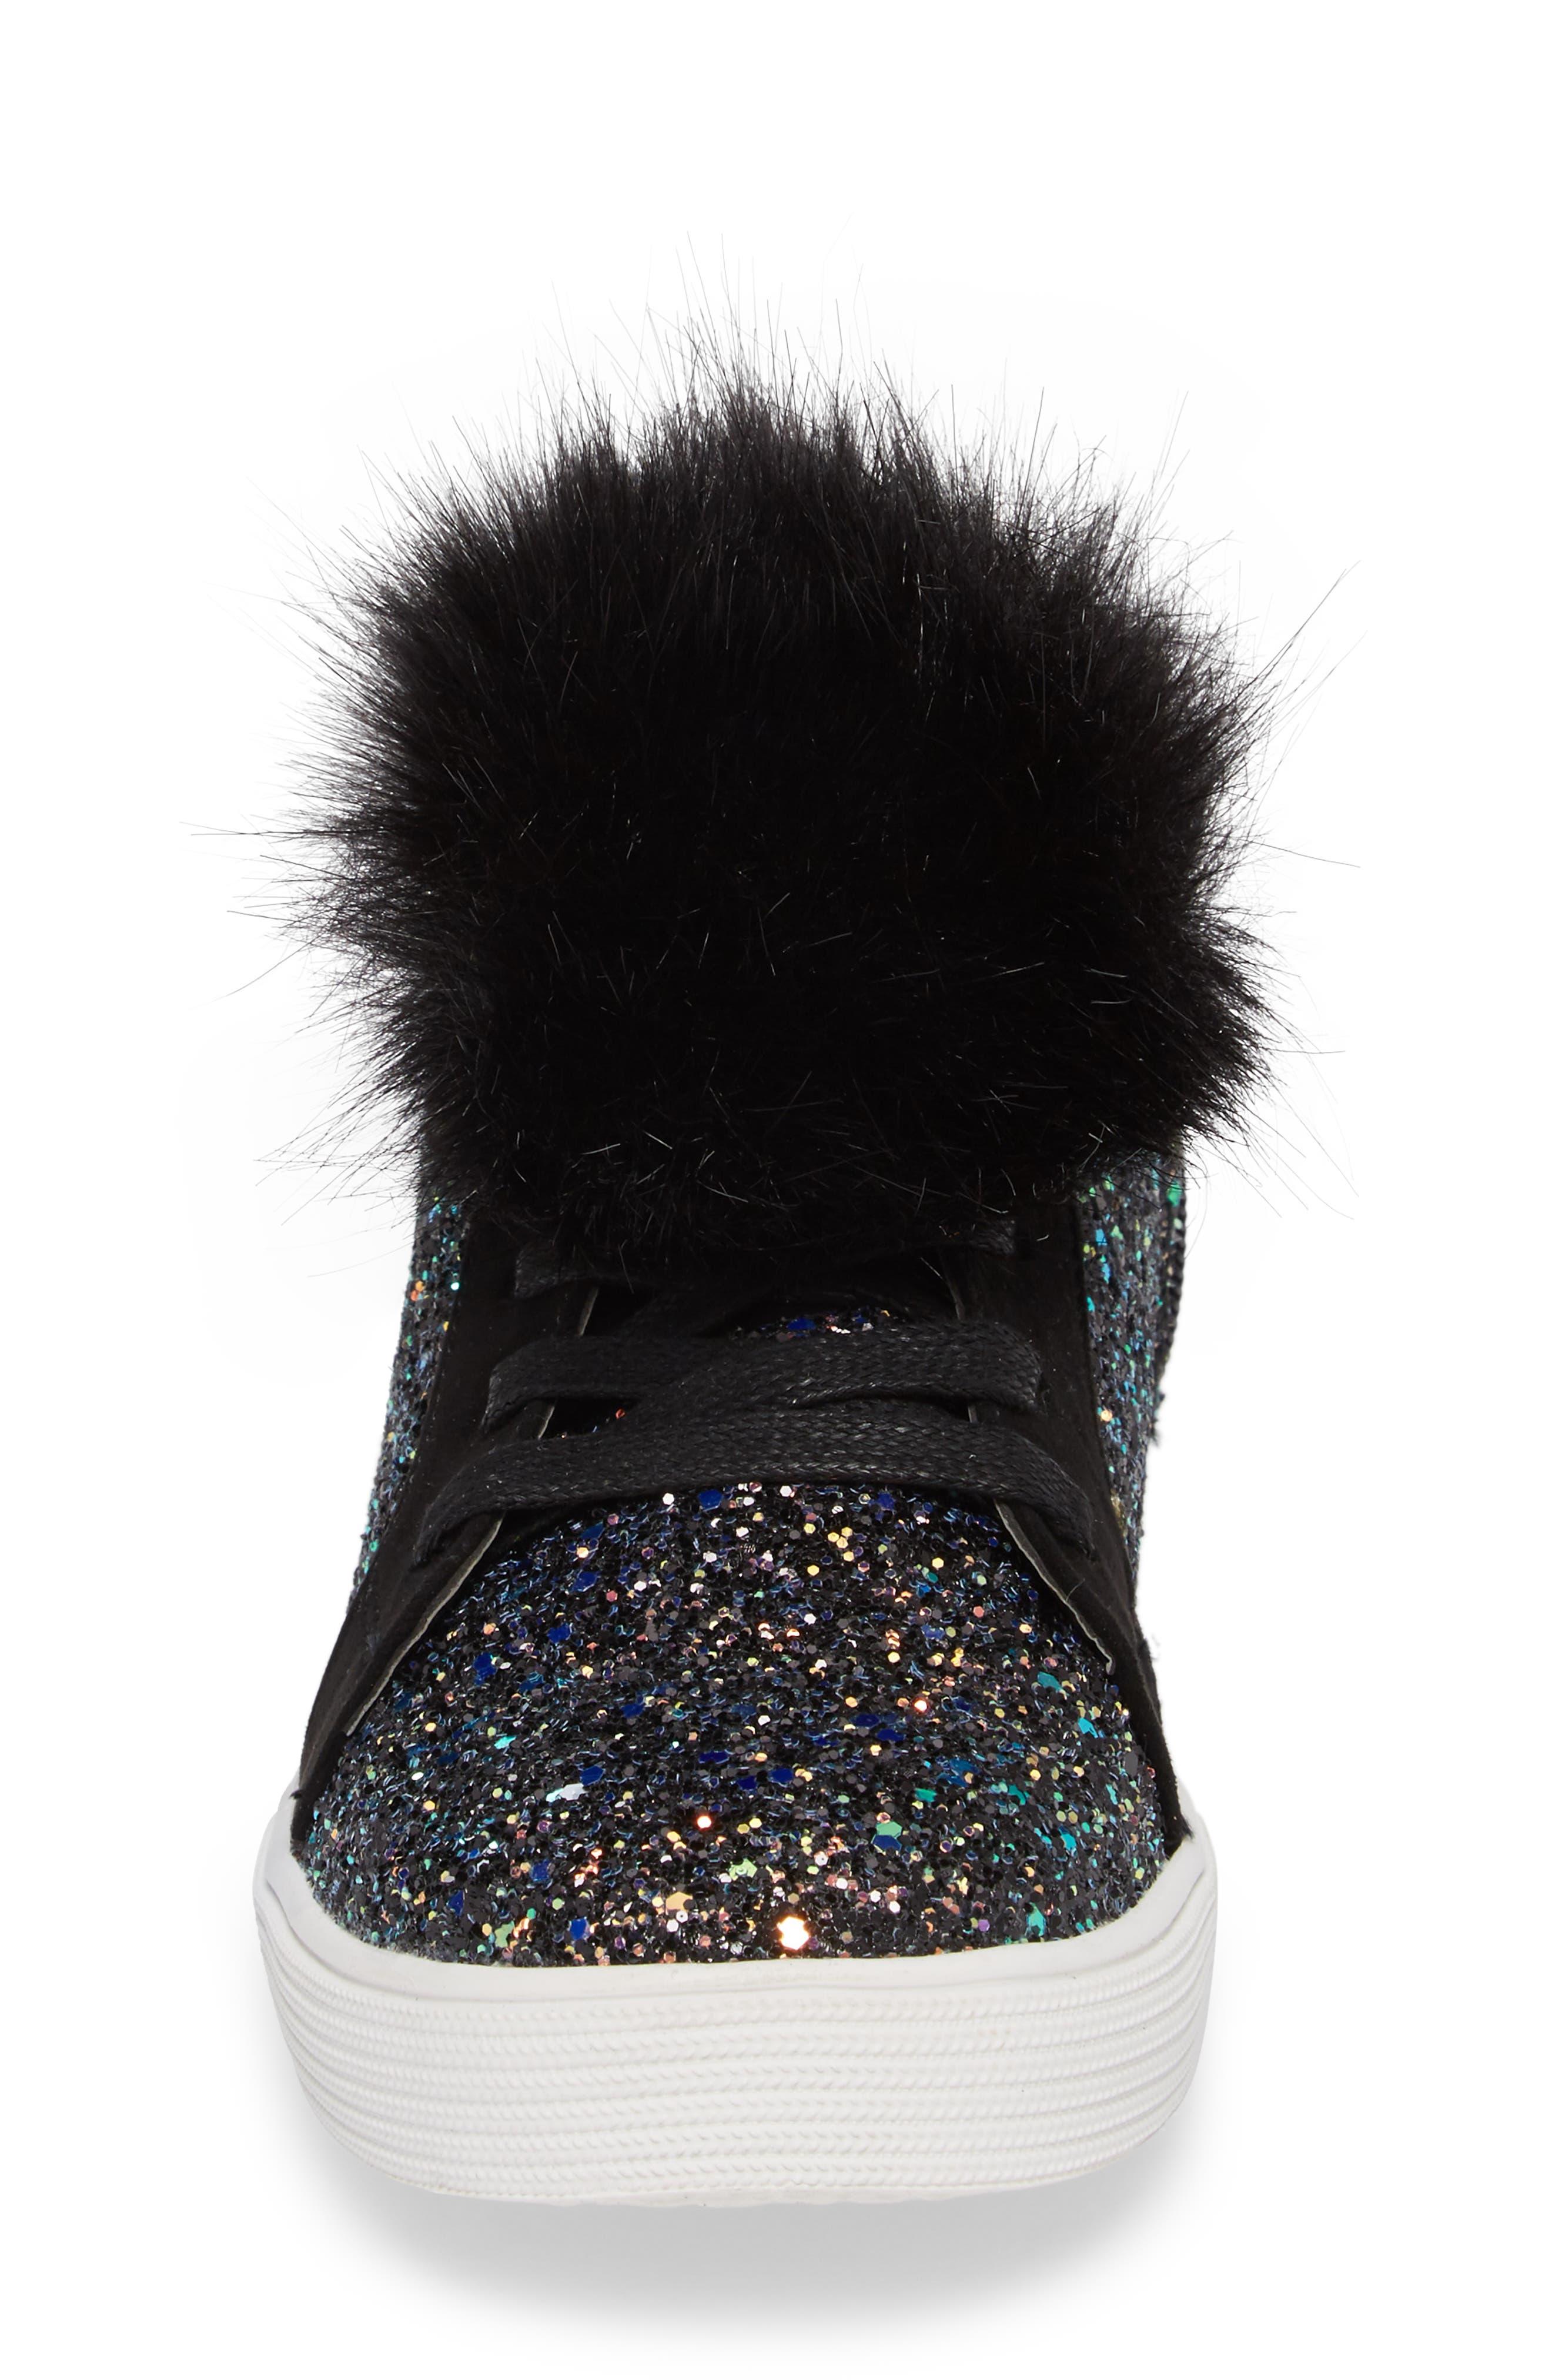 Bella Hira Faux Fur Glitter Pom Sneaker,                             Alternate thumbnail 4, color,                             Black Multi Chunky Glitter